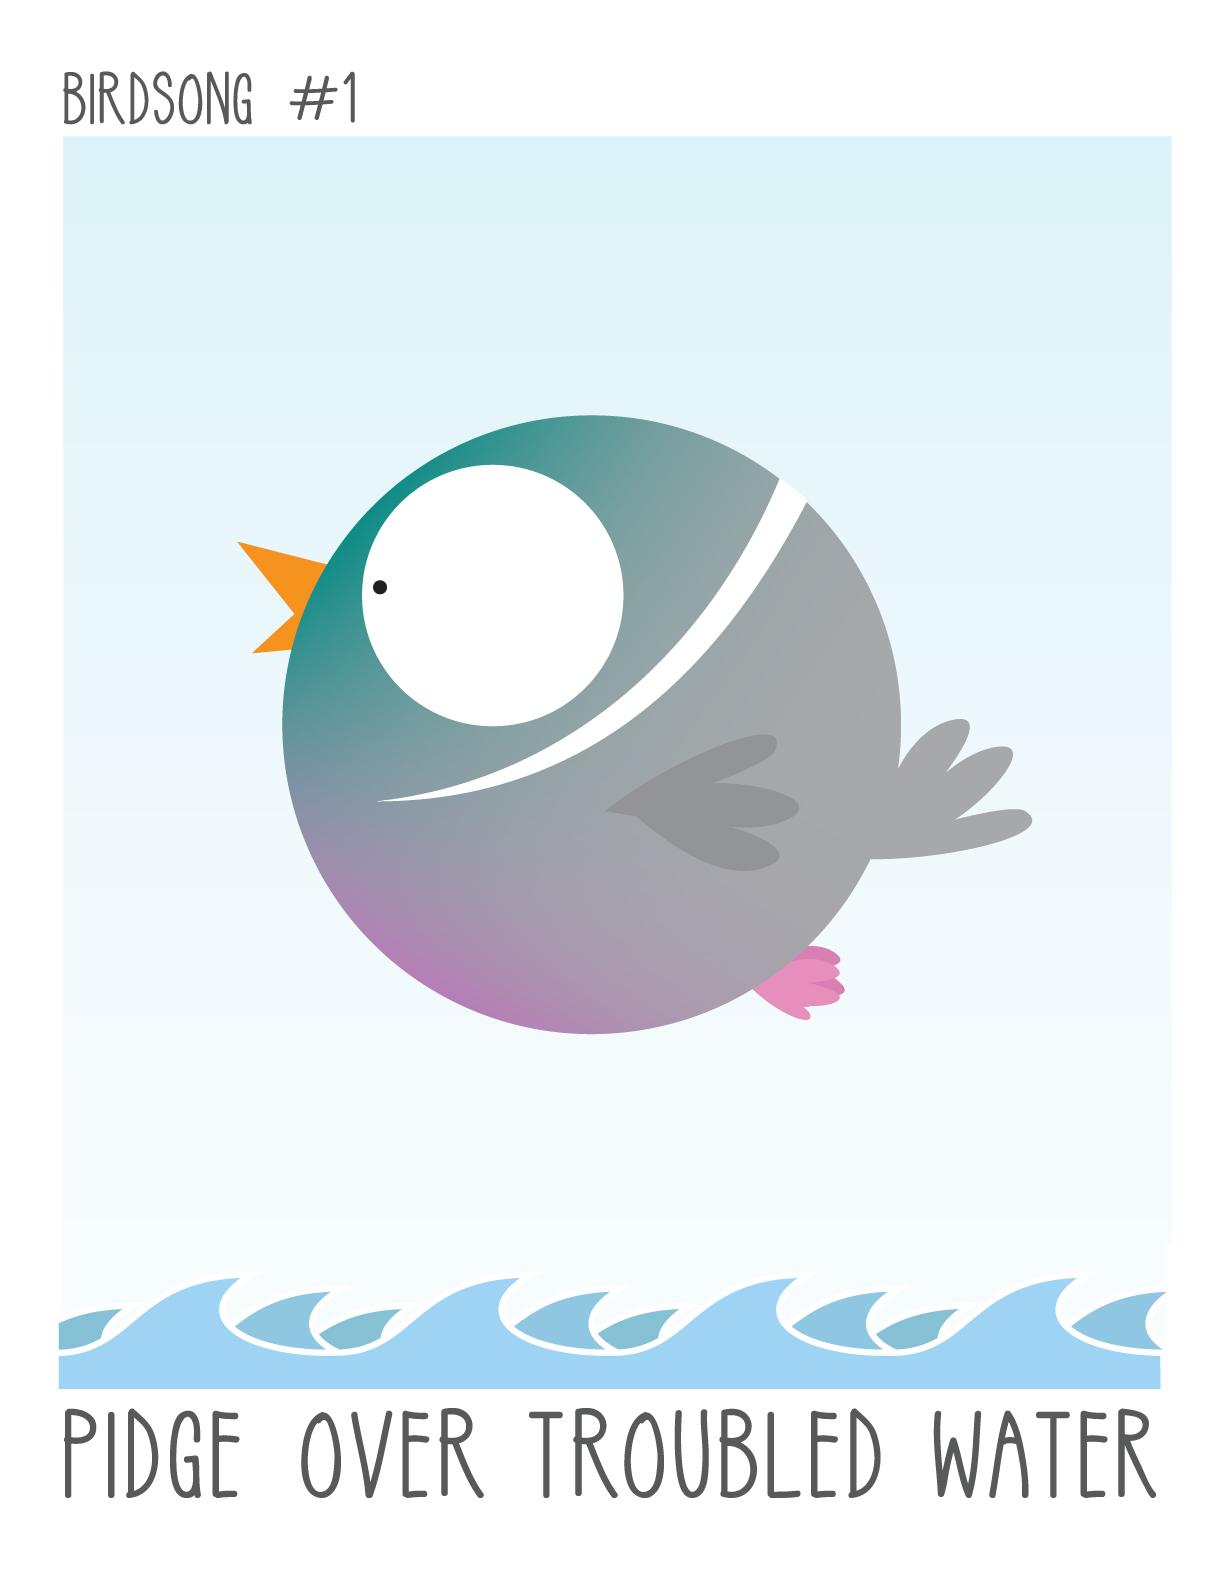 Bird song #1 Pidge.jpg